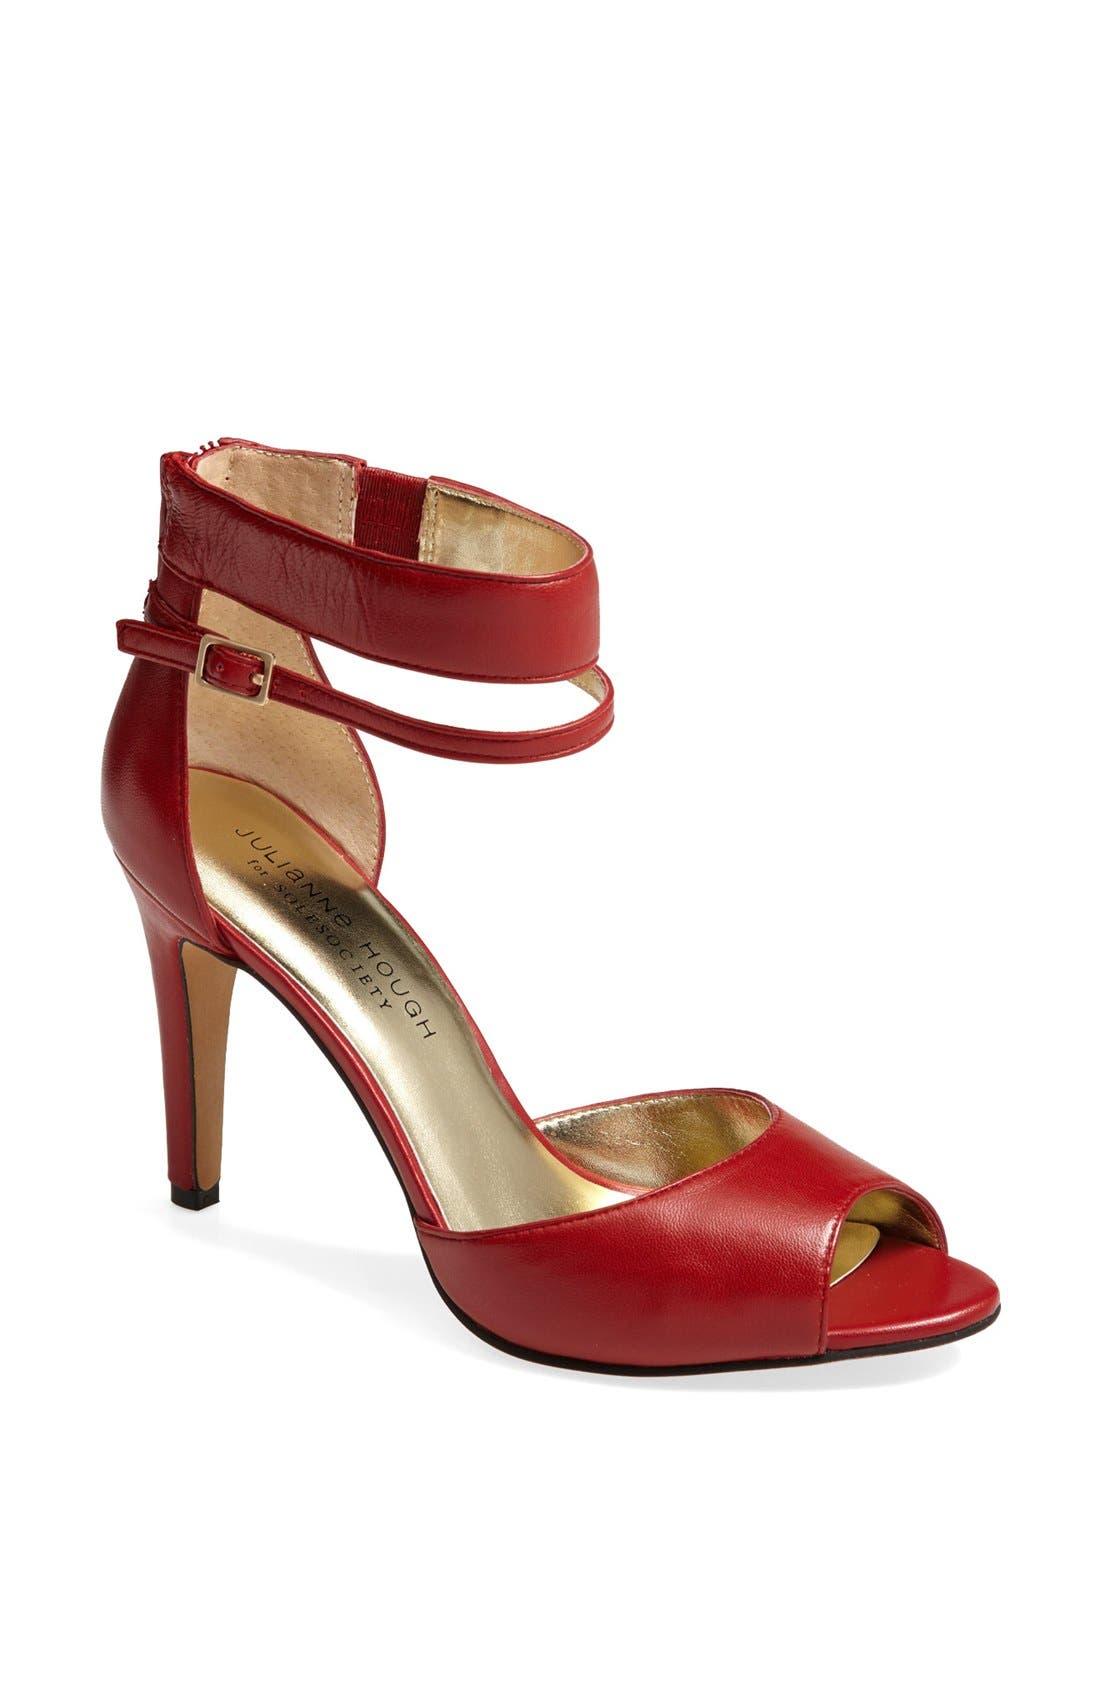 Alternate Image 1 Selected - Julianne Hough for Sole Society 'Denelle' Ankle Strap Sandal